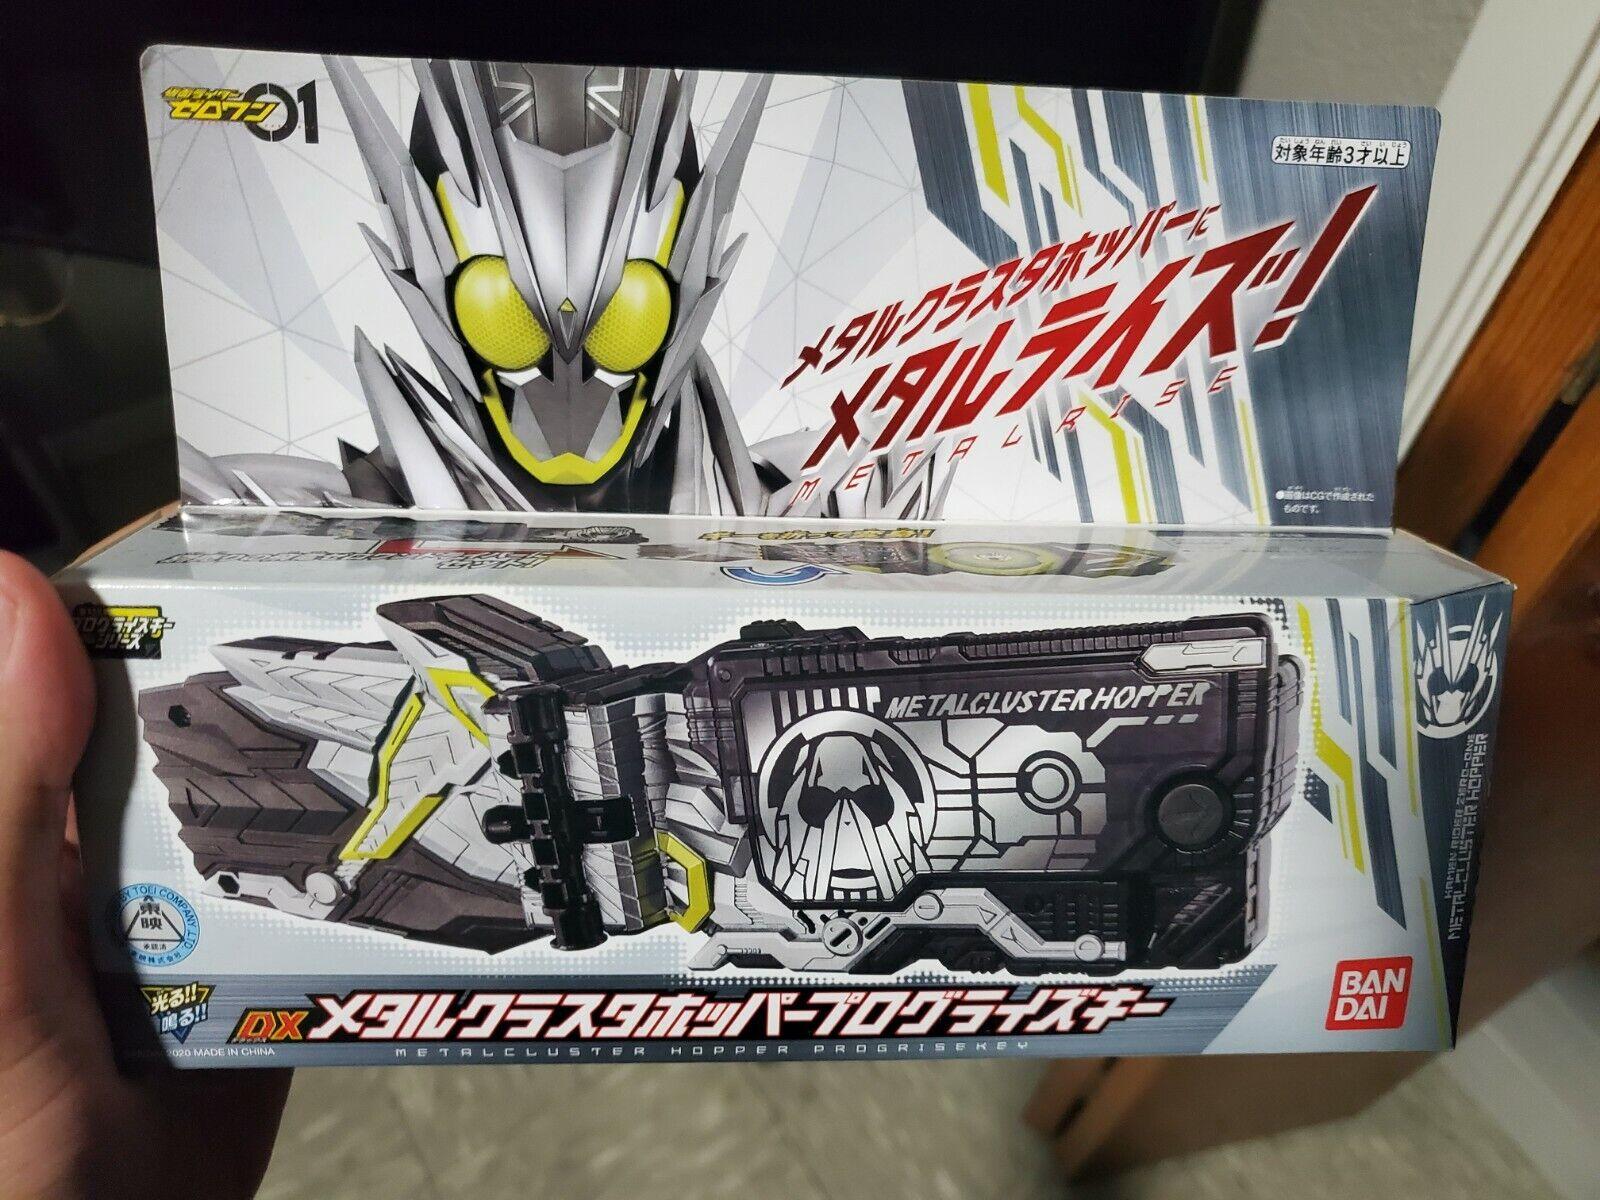 Kamen Rider Zero-One 01 DX Metal Cluster Hopper Progrise Key Henshin Toy Bandai